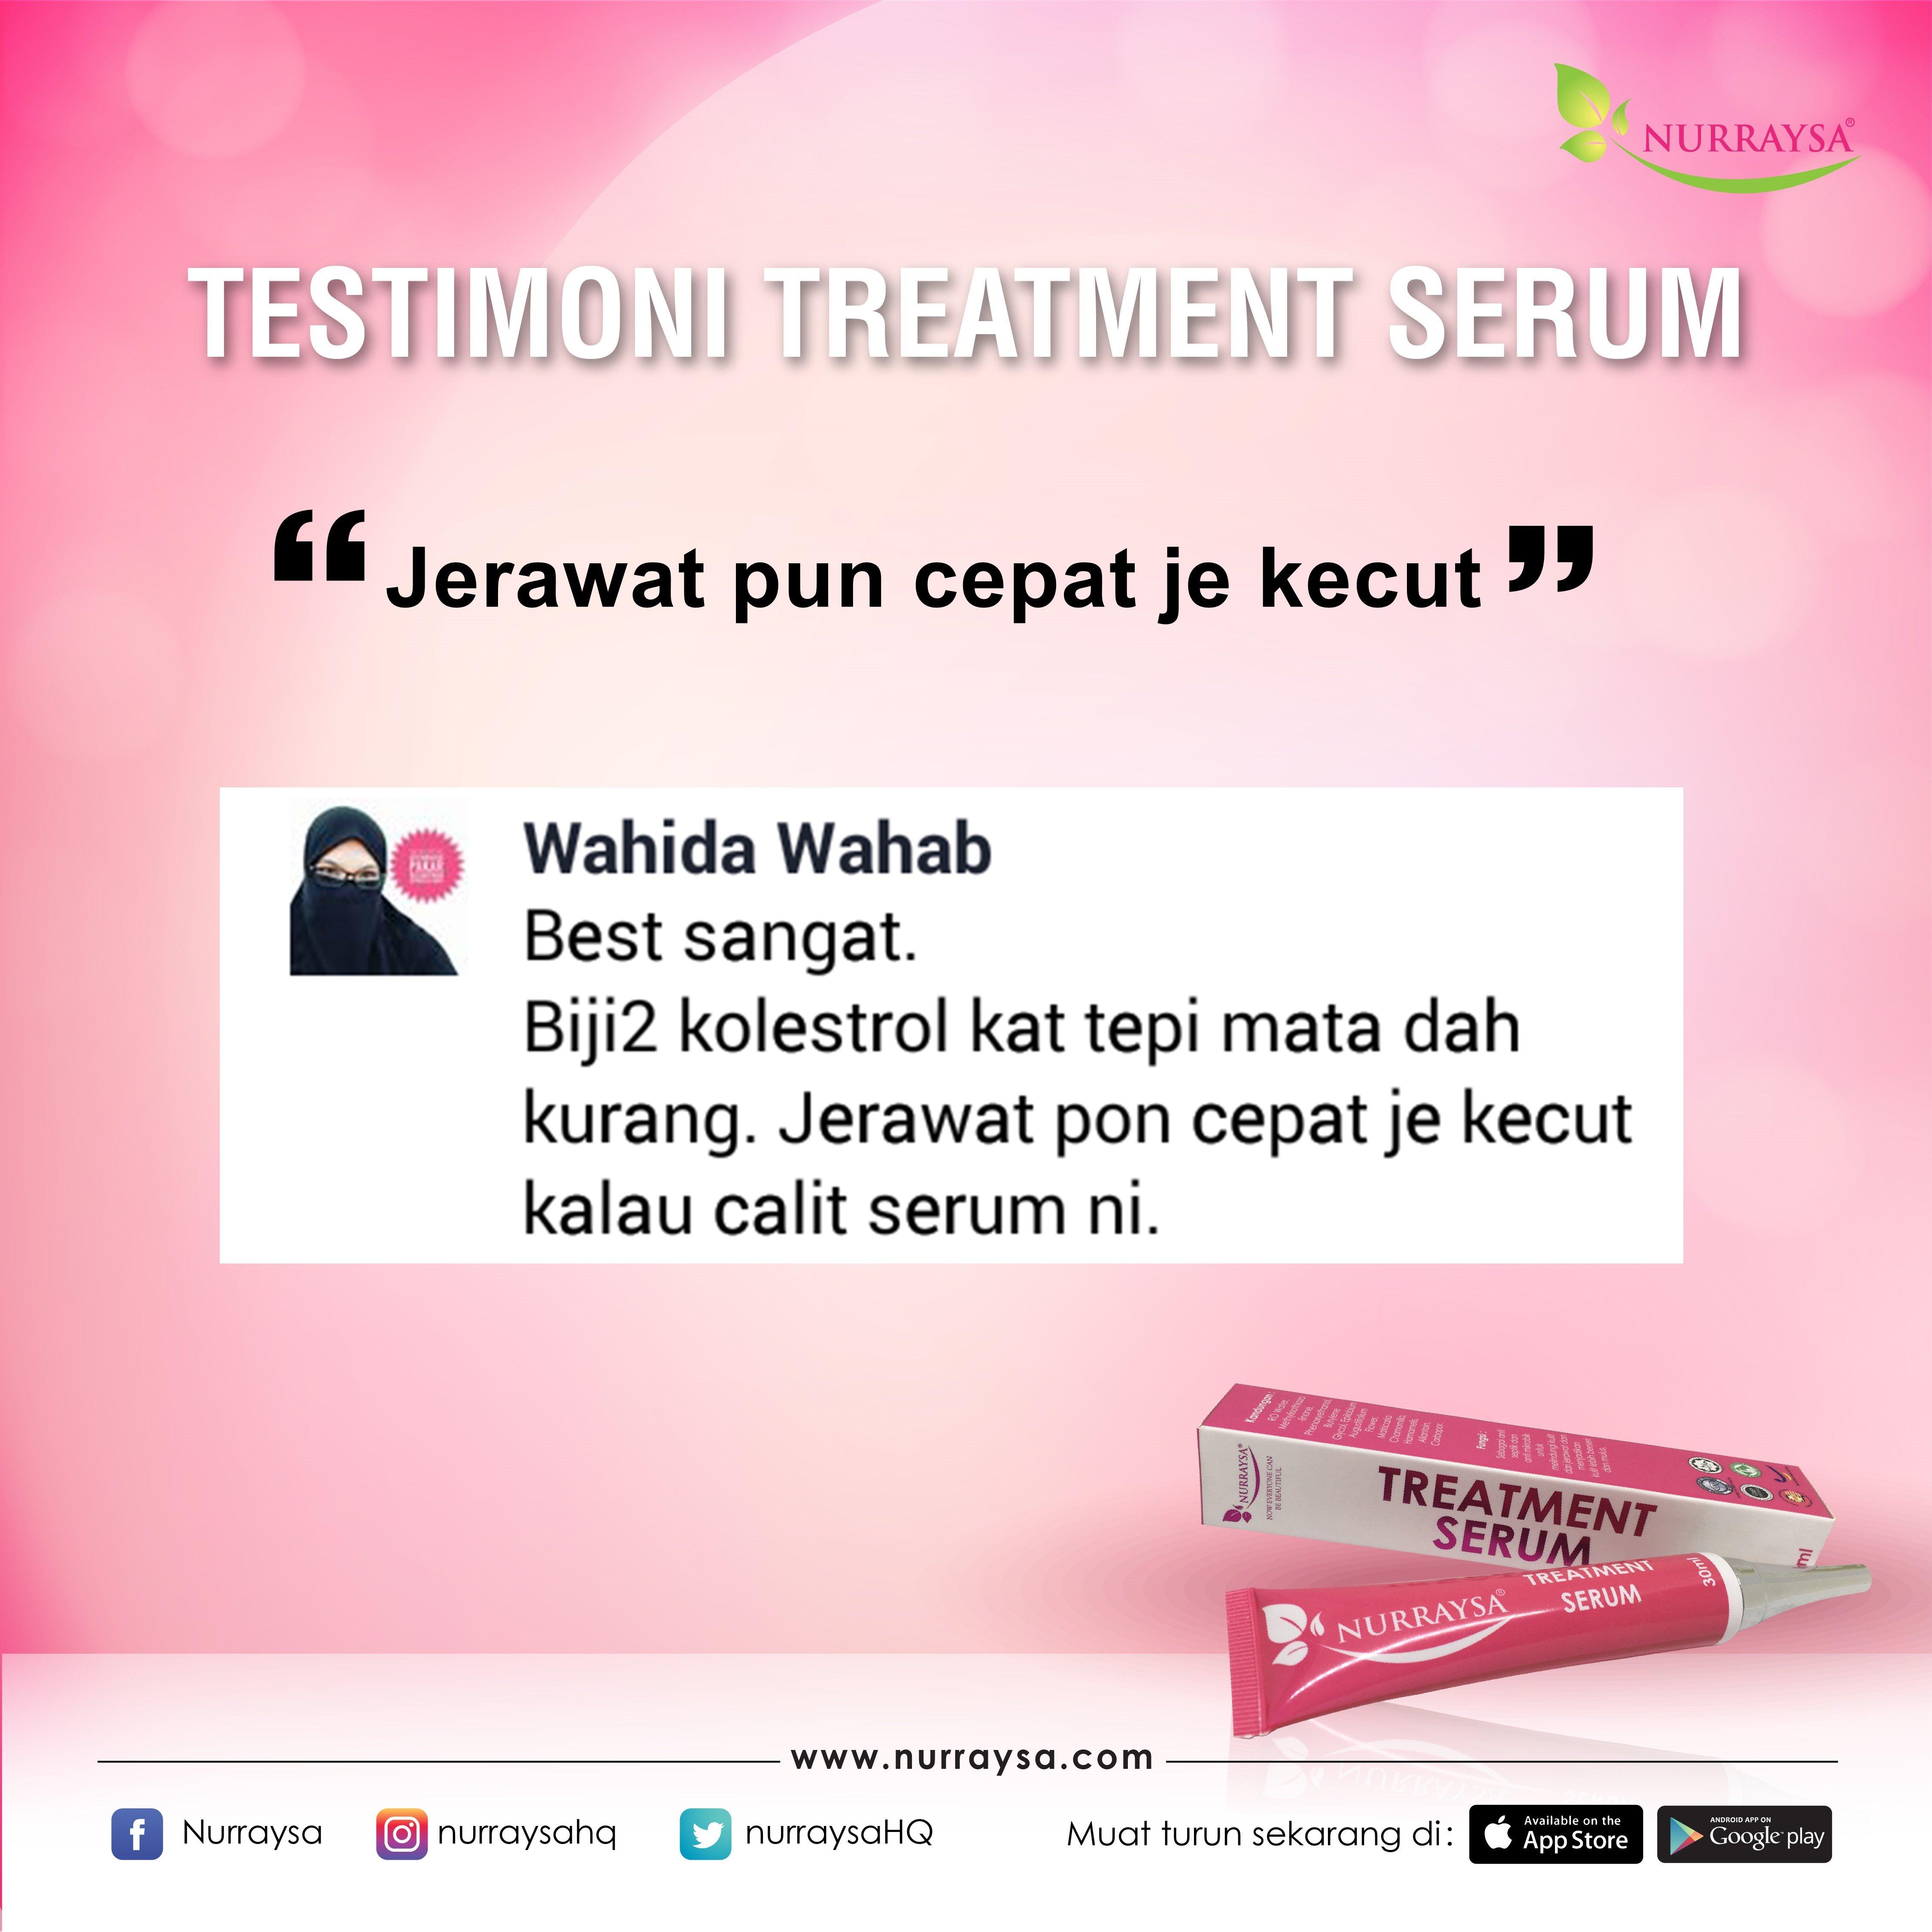 Testimoni Treatment Serum 7